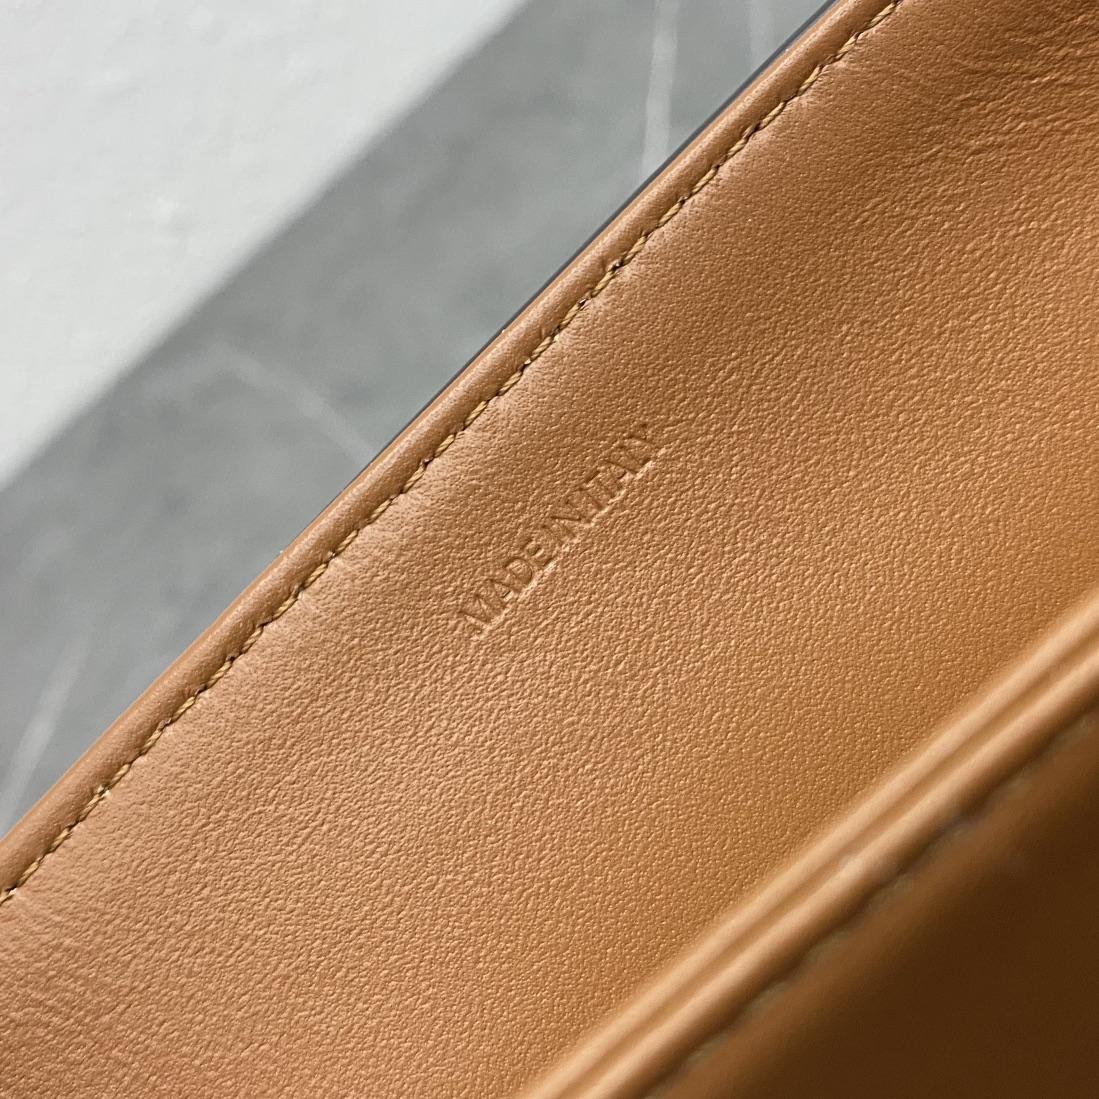 【P1580】Celine TABOU 思琳秋冬新款锁扣翻盖单肩斜挎包 196583黄褐棕